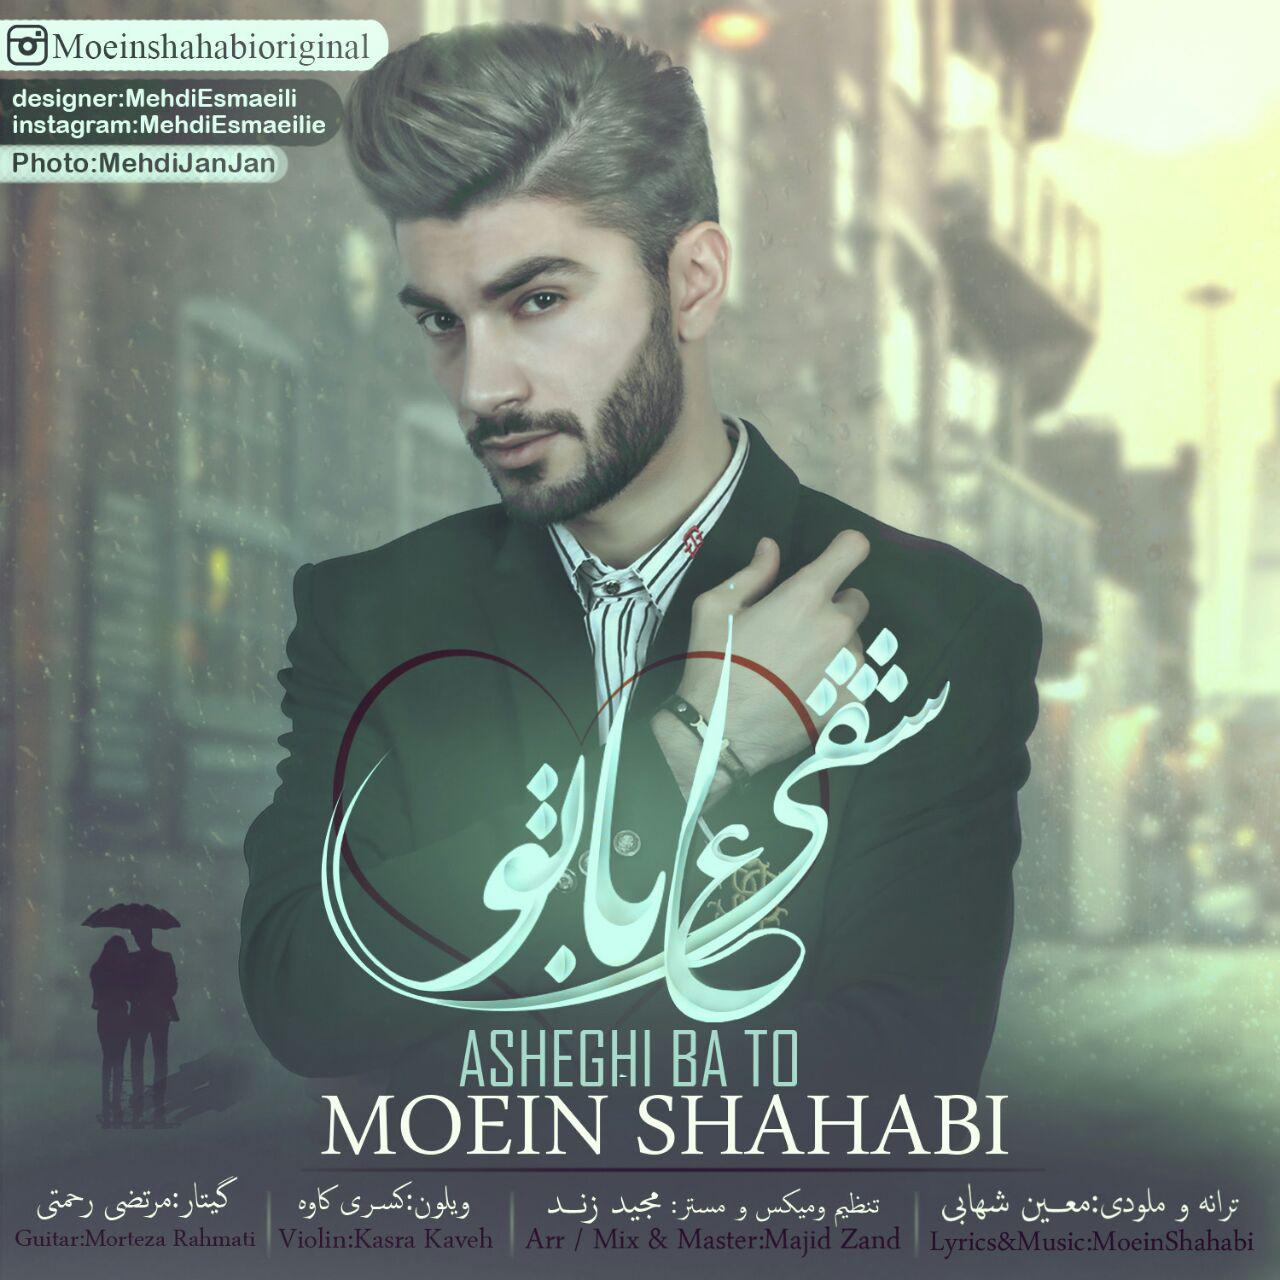 معین شهابی عاشقی با تو Moein Shahabi Asheghi Ba To